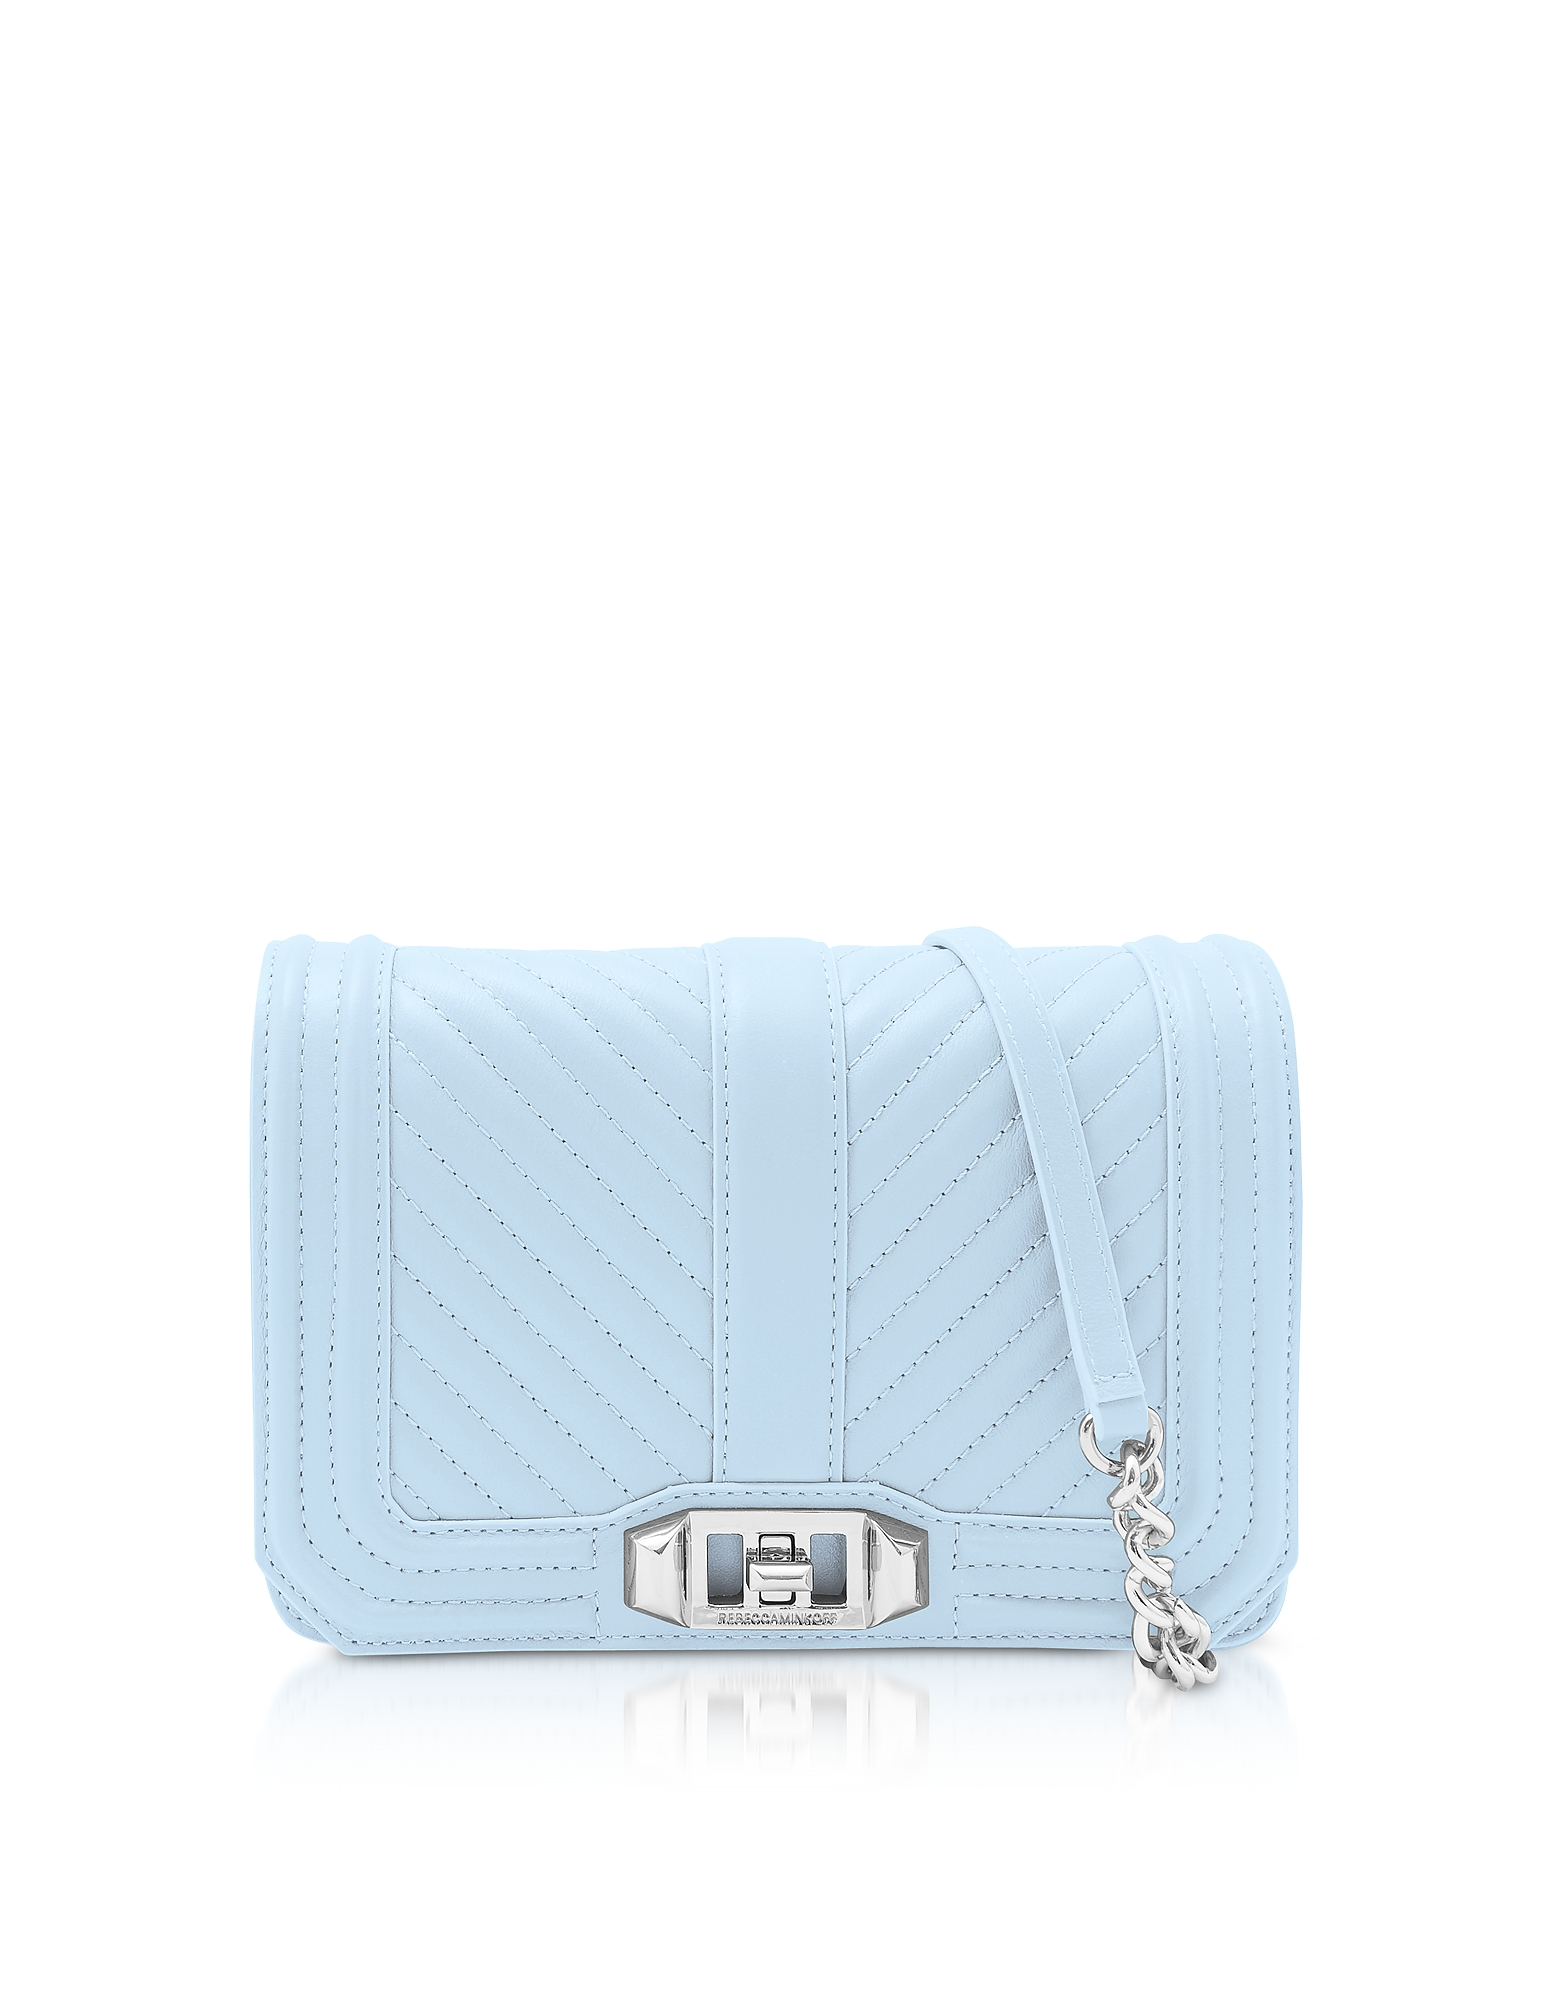 Rebecca Minkoff Handbags, Chevron Quilted Leather Small Love Crossbody